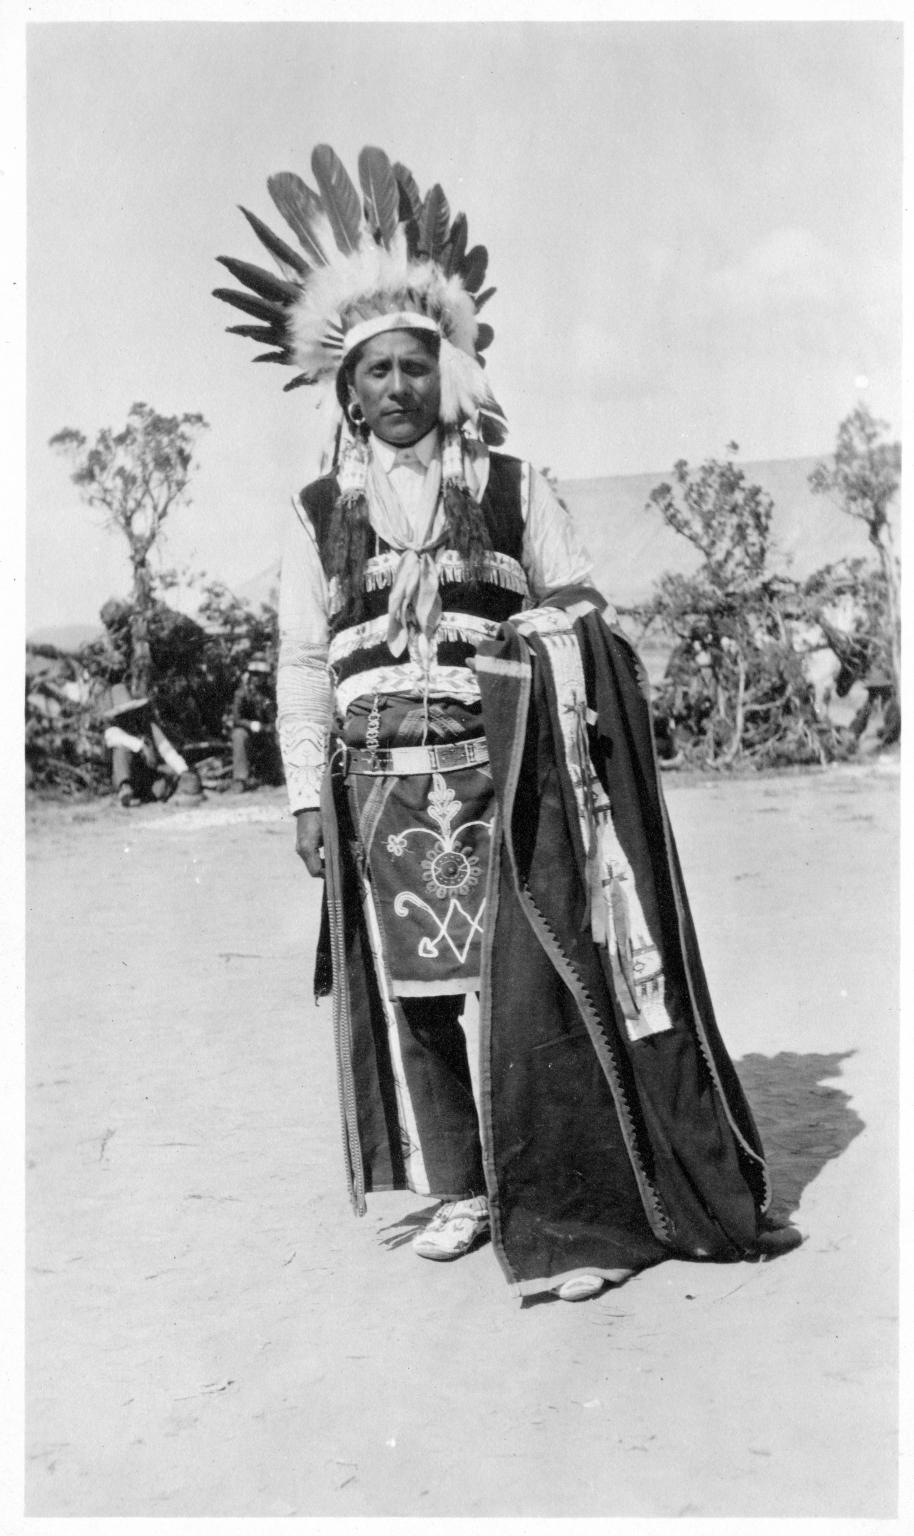 Portrait of a Ute Mountain Ute man